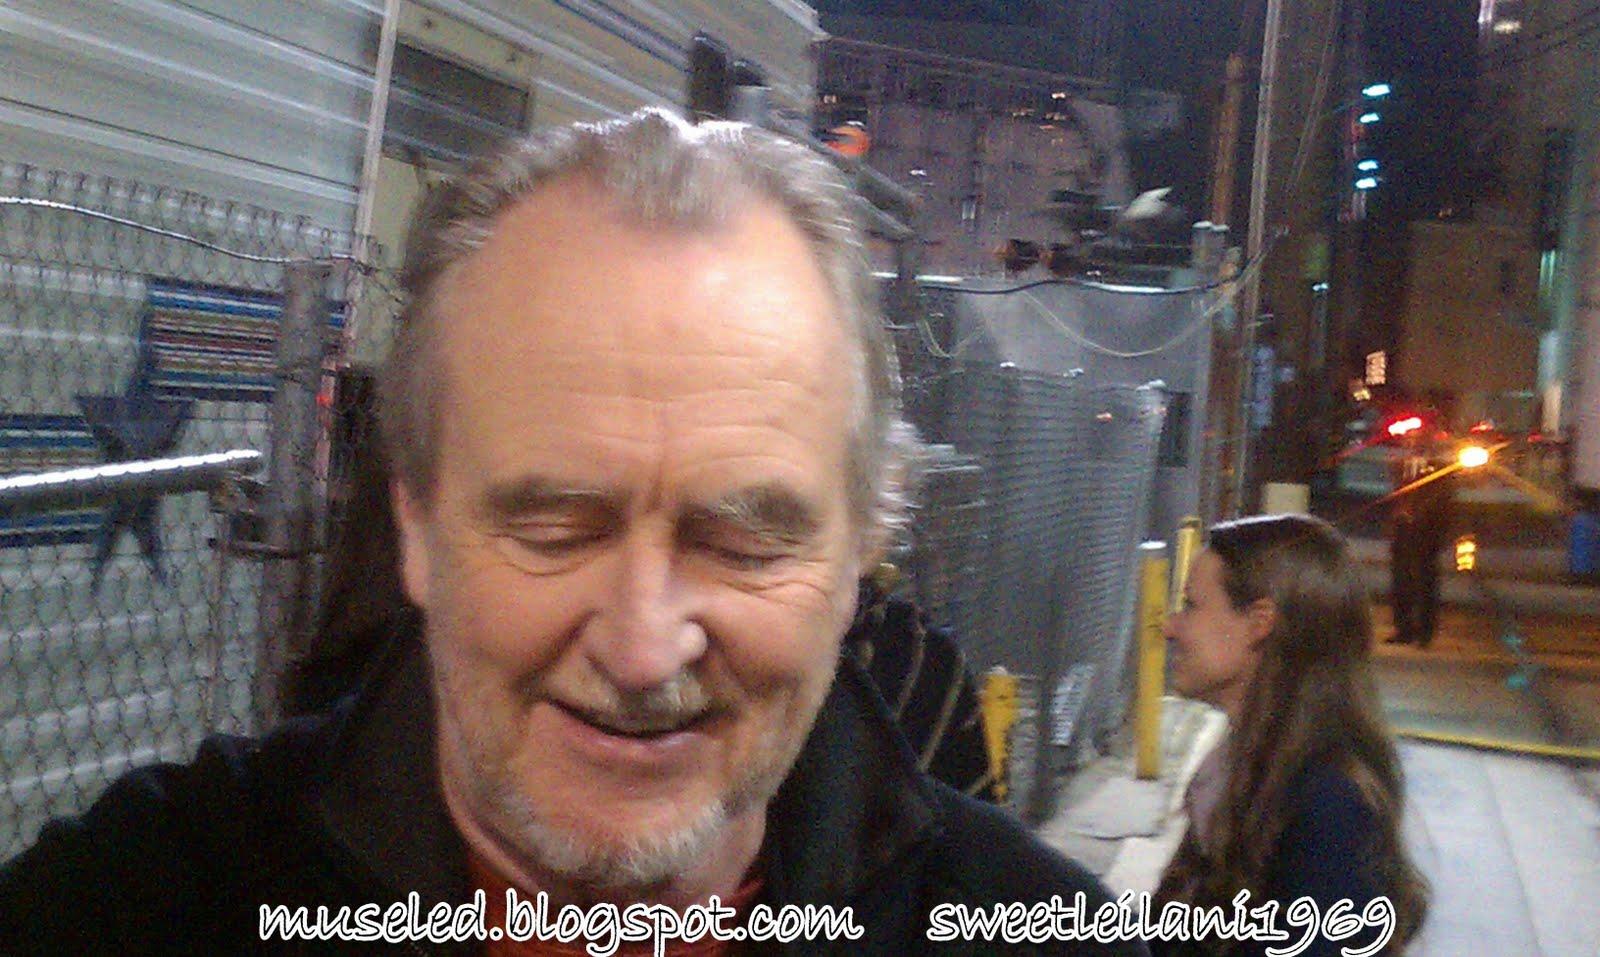 http://1.bp.blogspot.com/-pU6QIXIIv1s/ThTVfihYHiI/AAAAAAAAACM/hc3DLfYqduI/s1600/IMAG0065.jpg